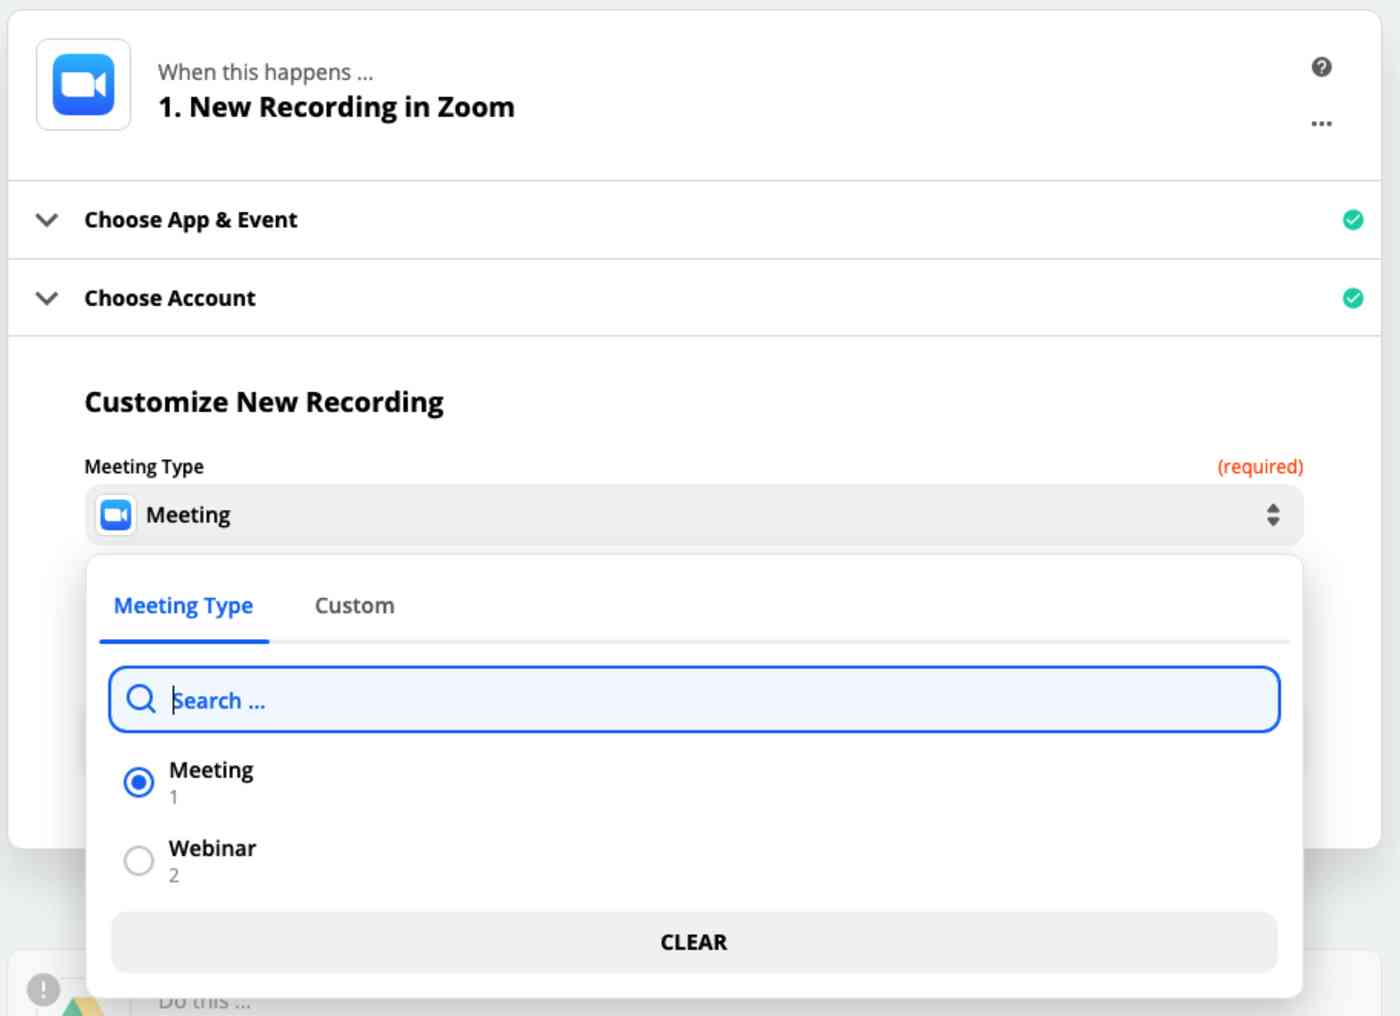 A screenshot of Zoom customization settings in the Zap Editor.